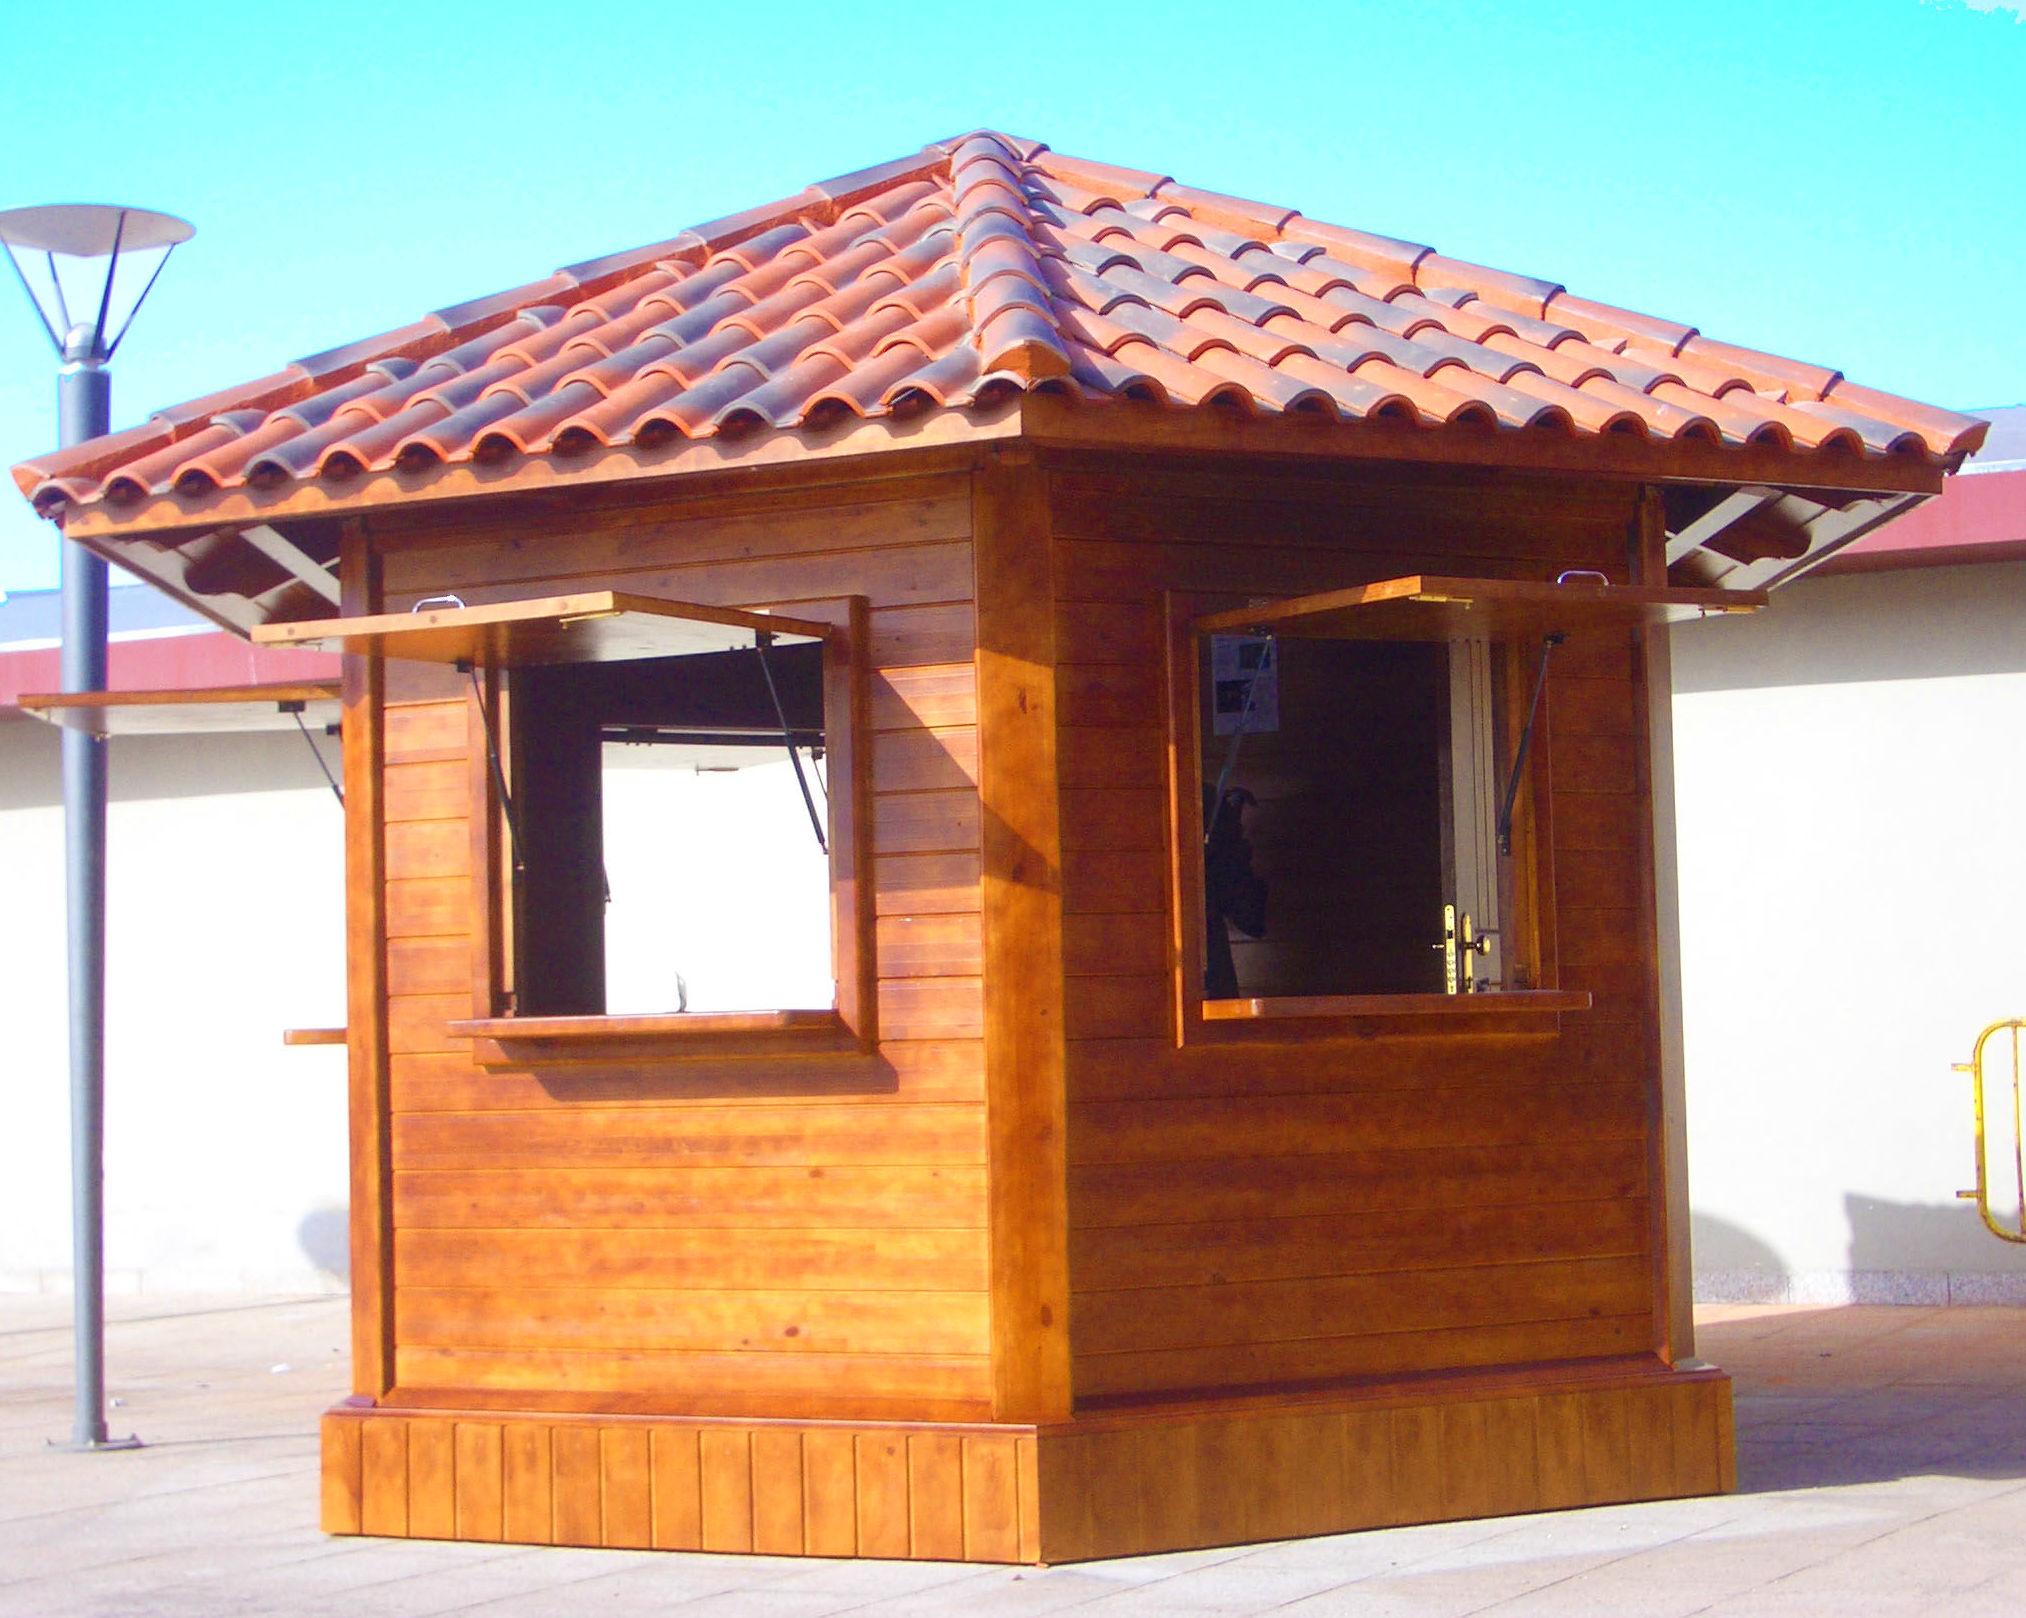 Caba as jard n garajes kioskos y casitas ni os for Kioscos de madera baratos